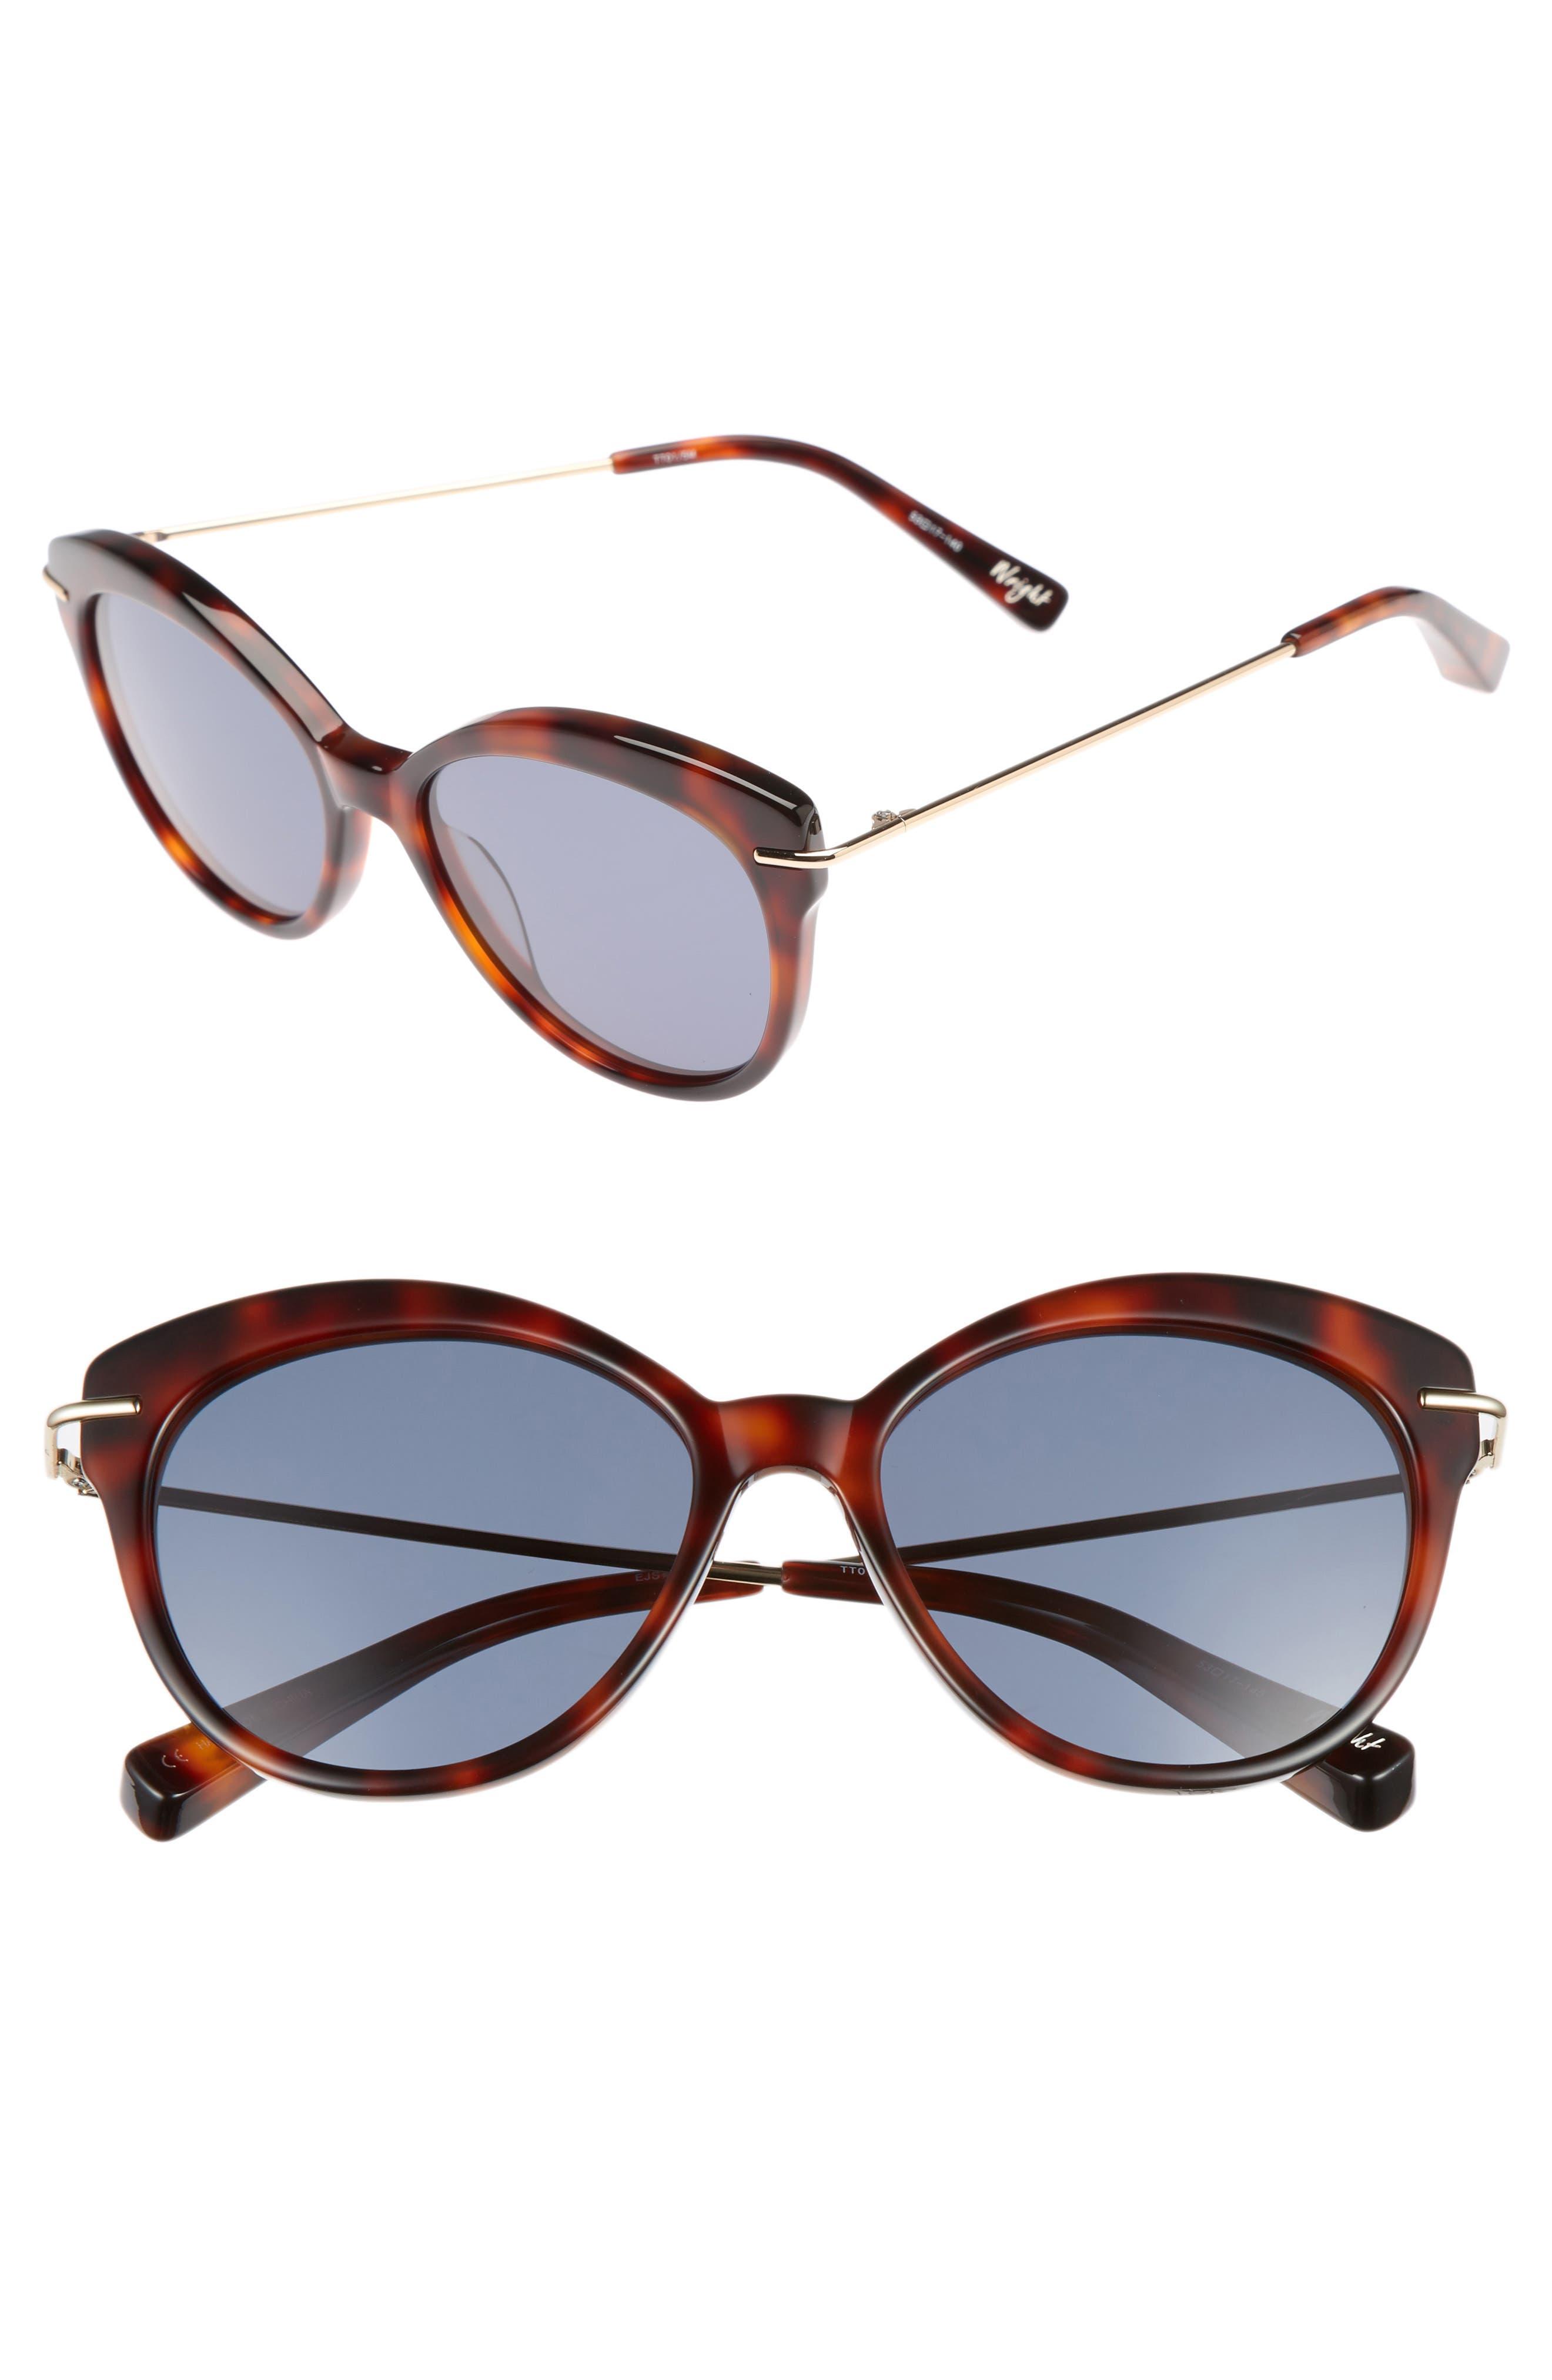 Wright 53mm Cat Eye Sunglasses,                         Main,                         color, Tortoise